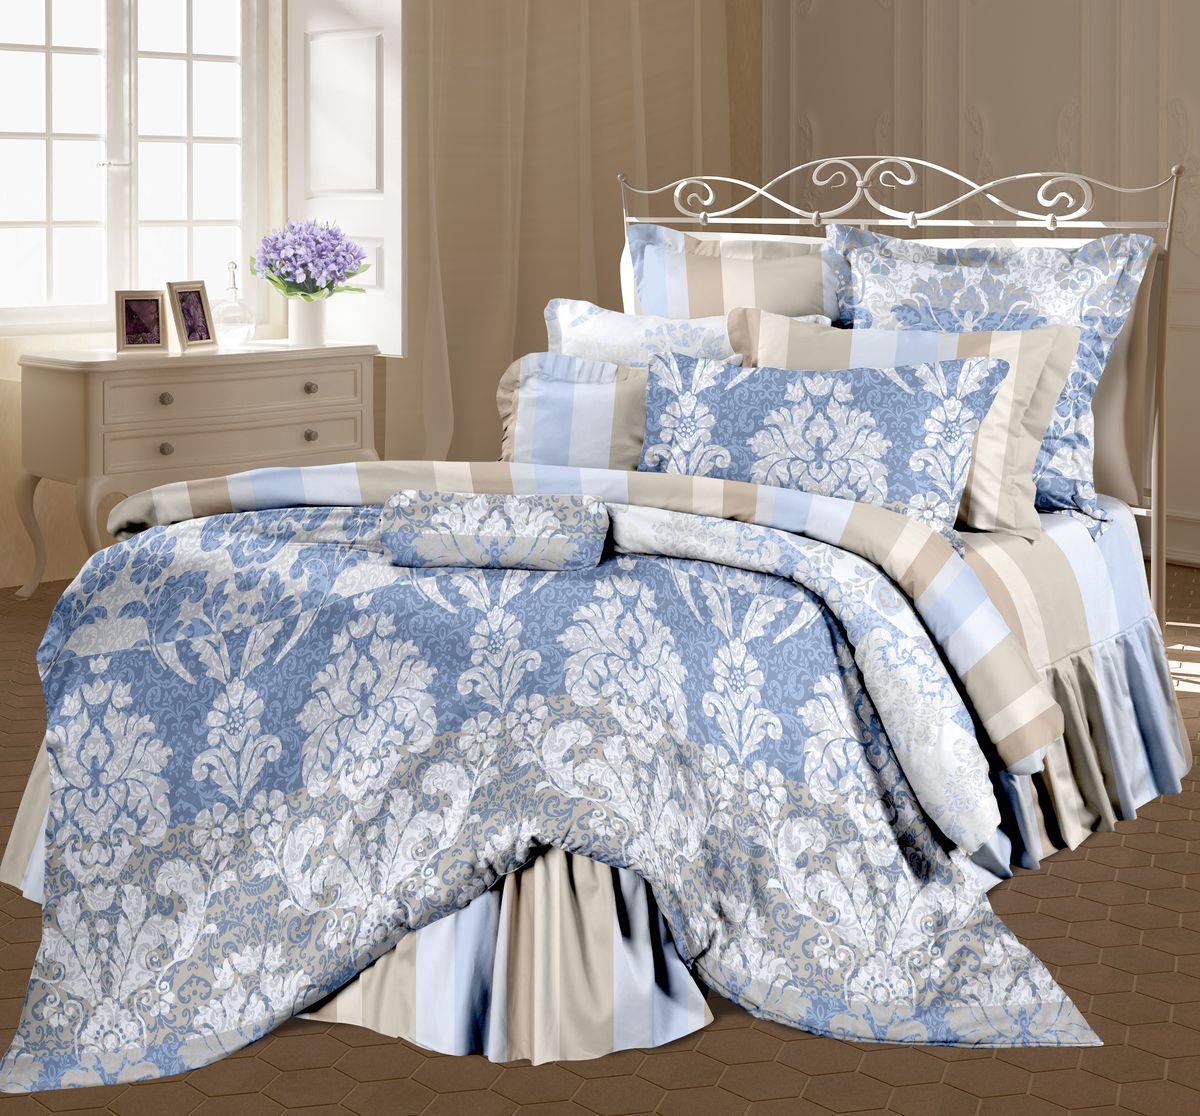 Комплект белья Романтика Александрия, семейный, наволочки 70 x 70, цвет: голубой. 325269325269